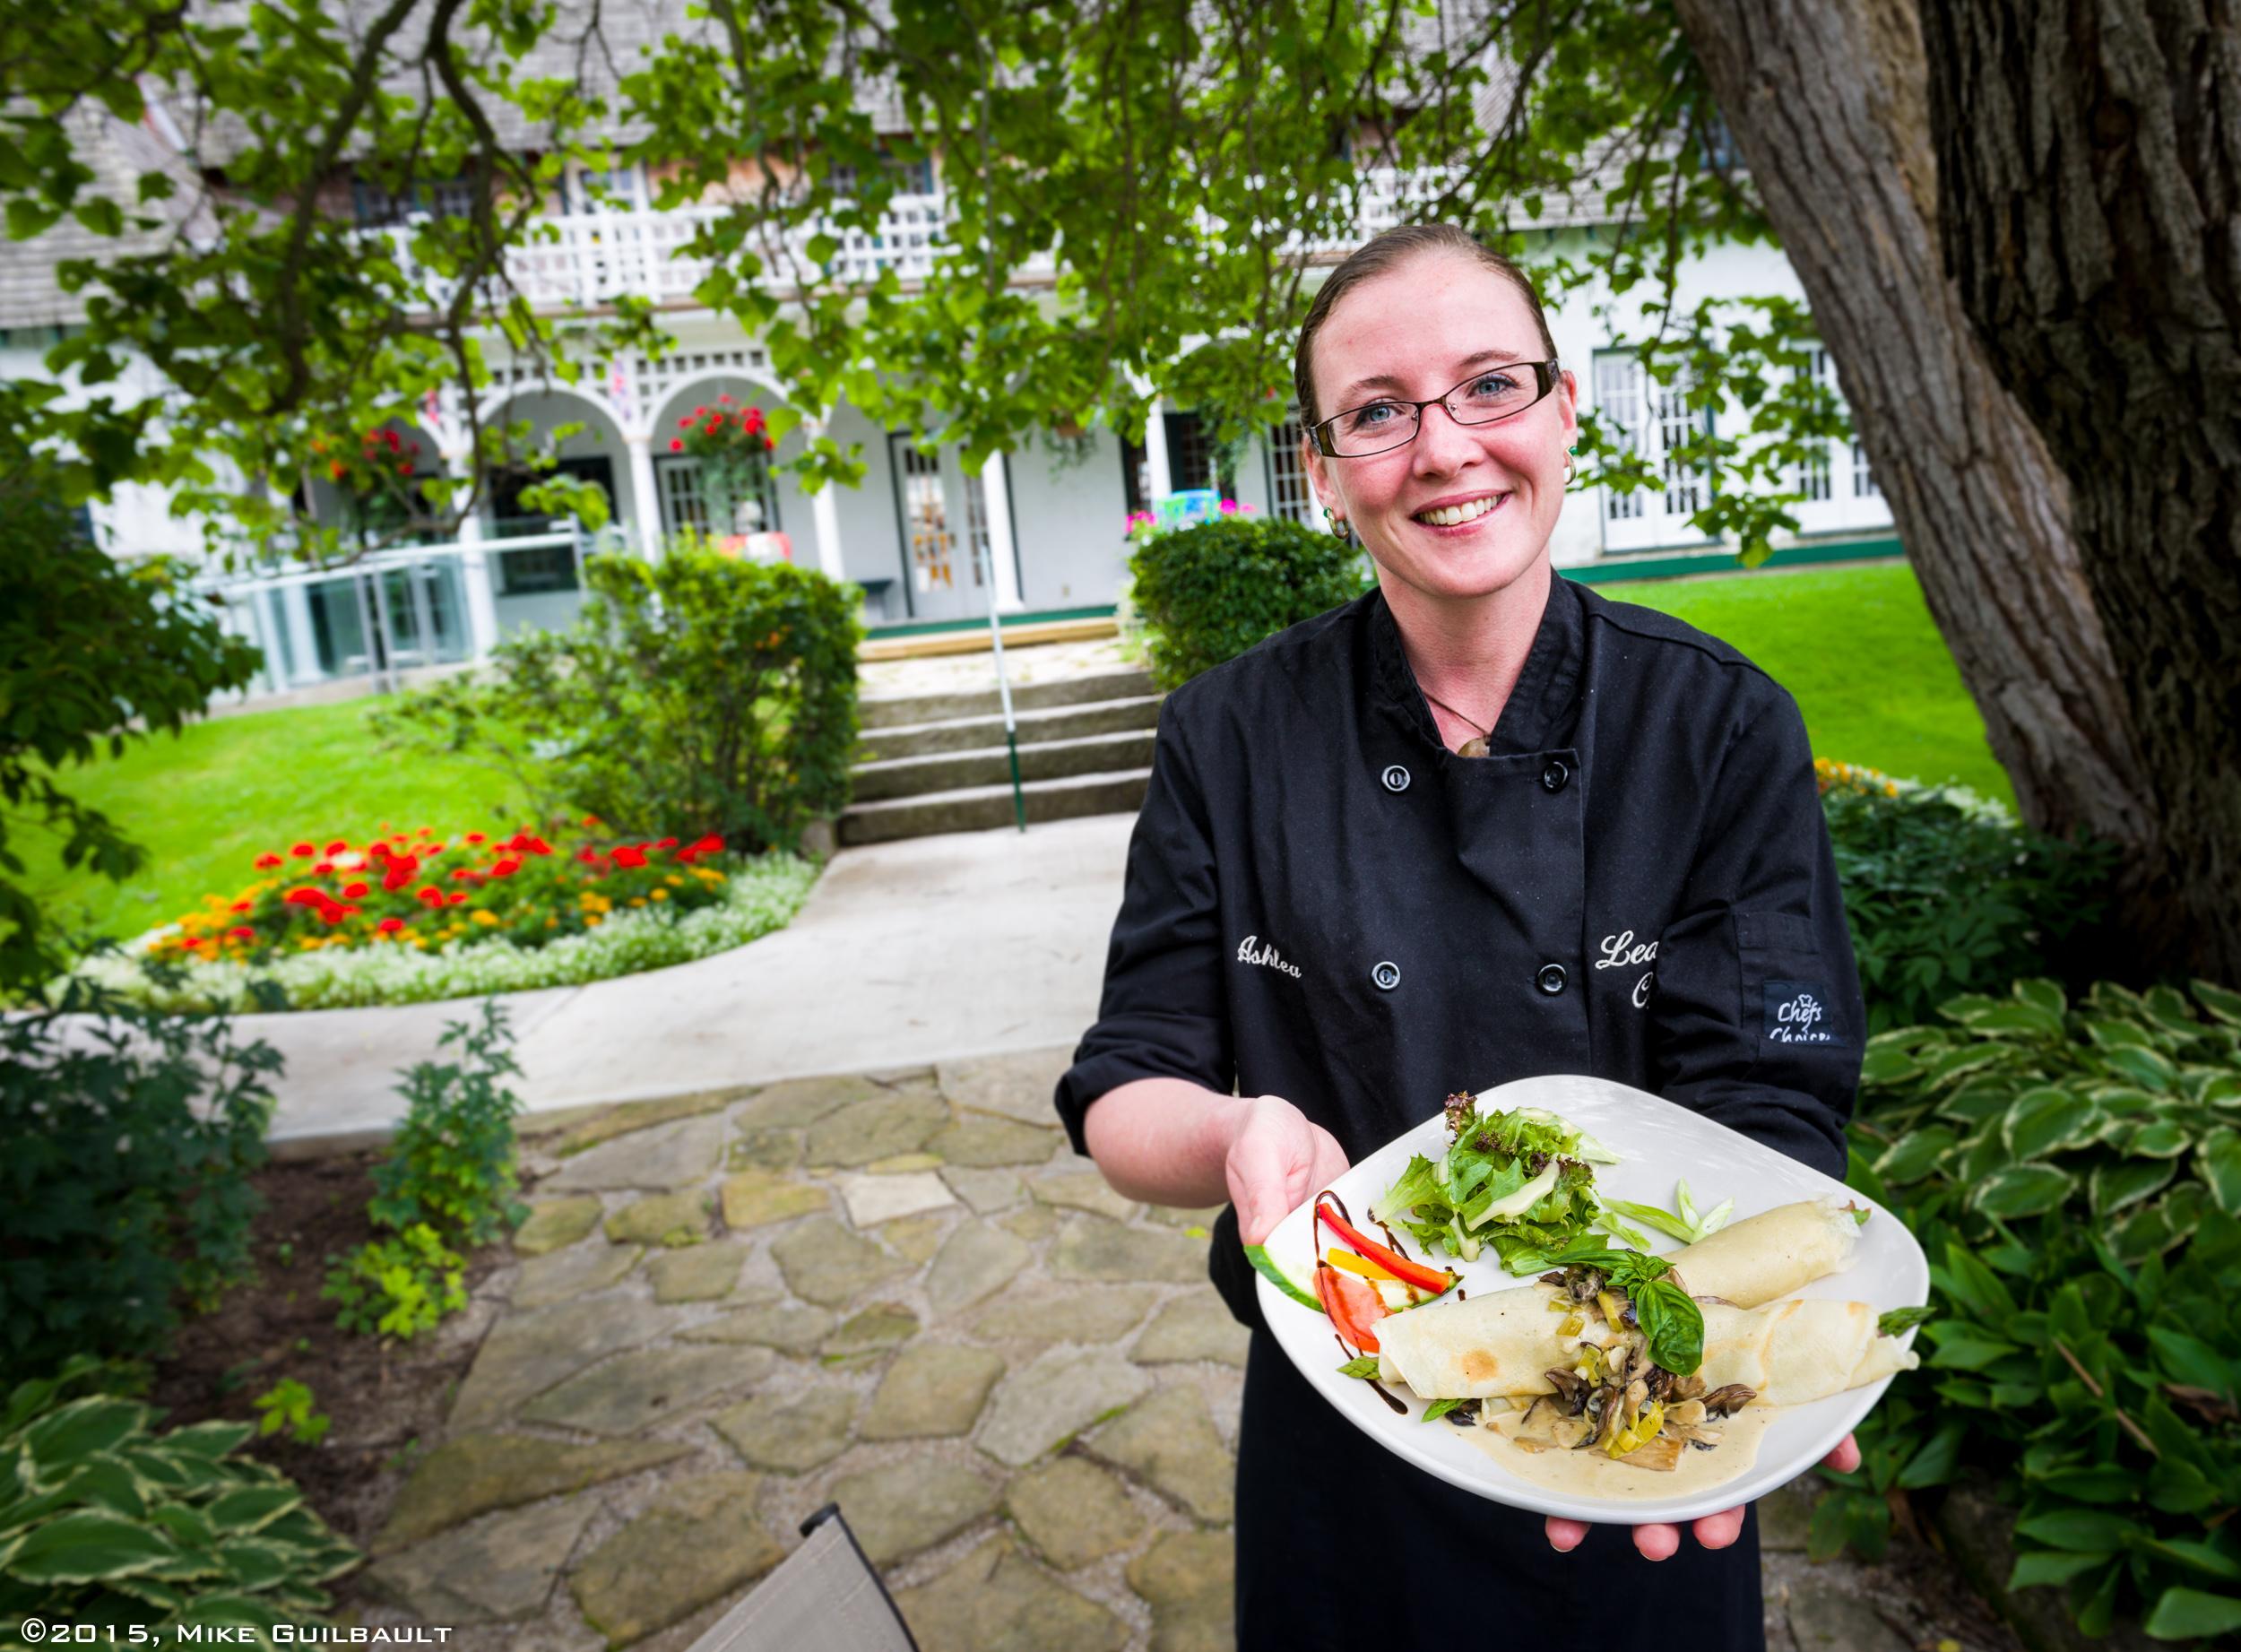 Environmental Portrait of Chef